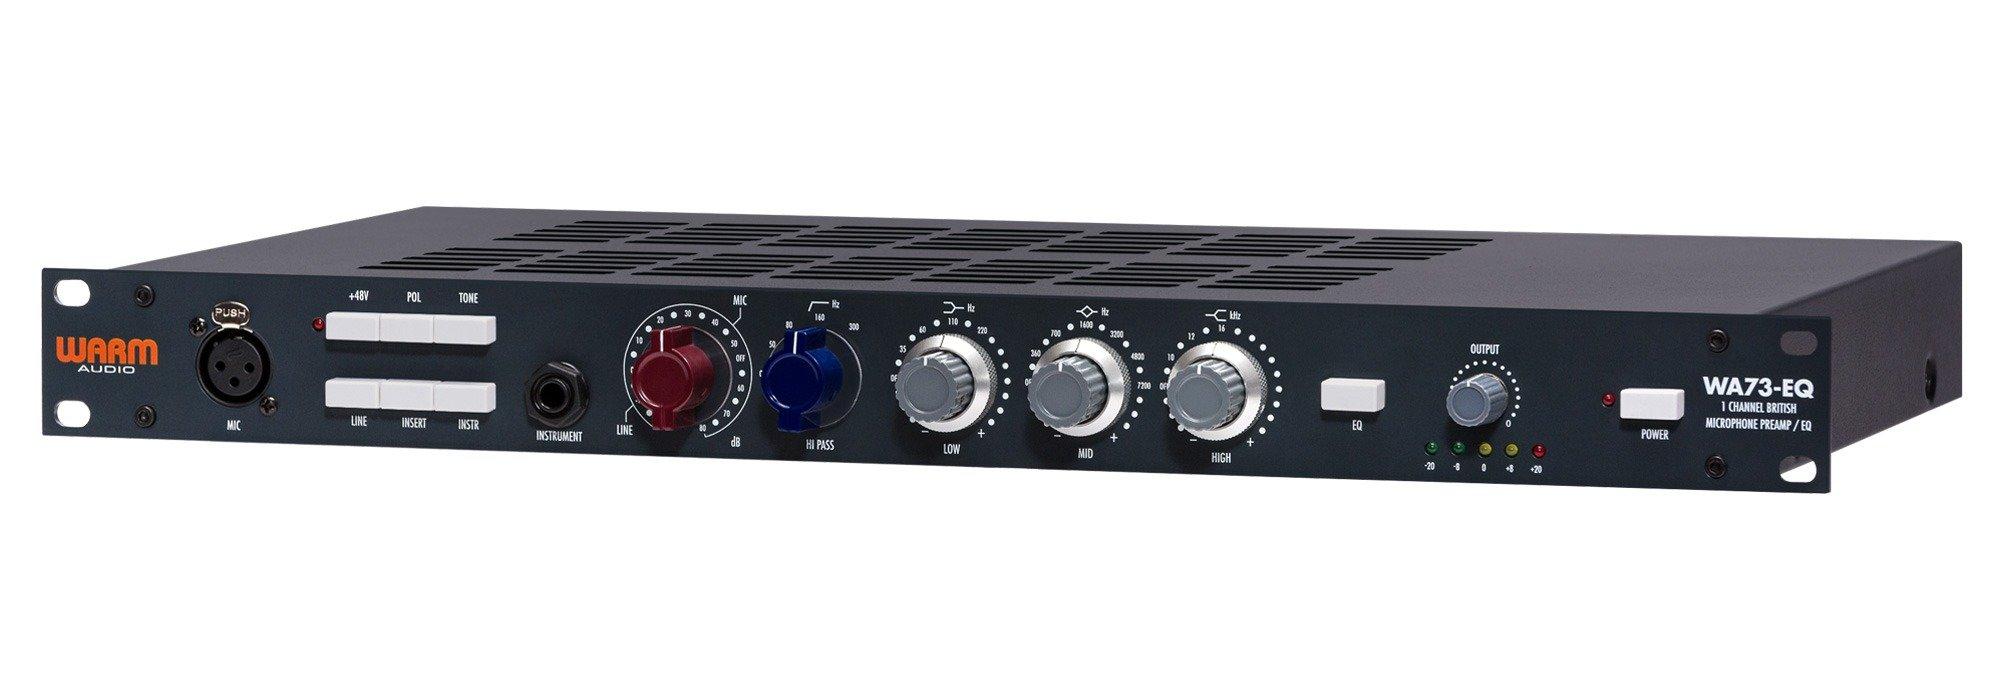 Warm Audio WA73-EQ One Channel British Mic Pre & EQ